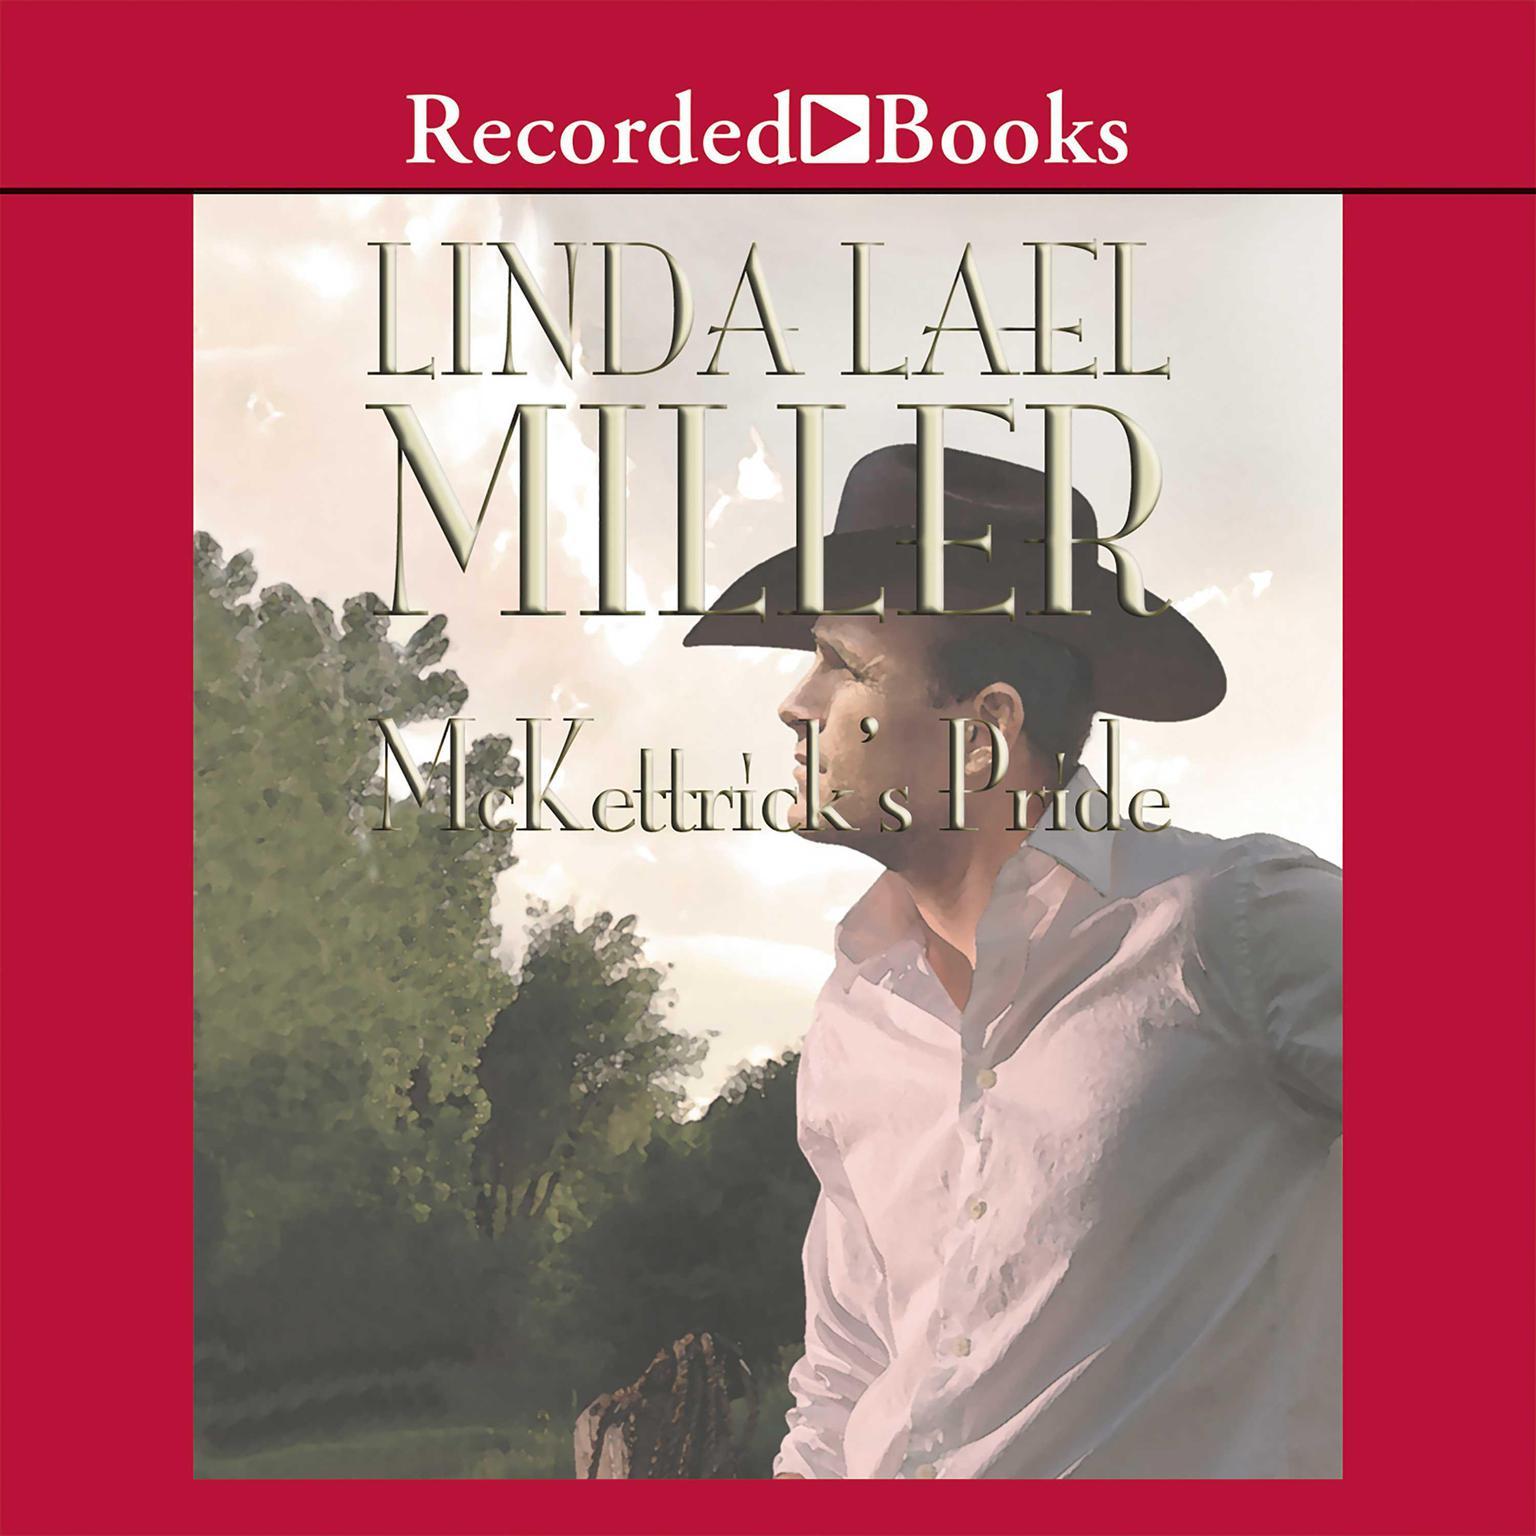 Printable McKettrick's Pride Audiobook Cover Art